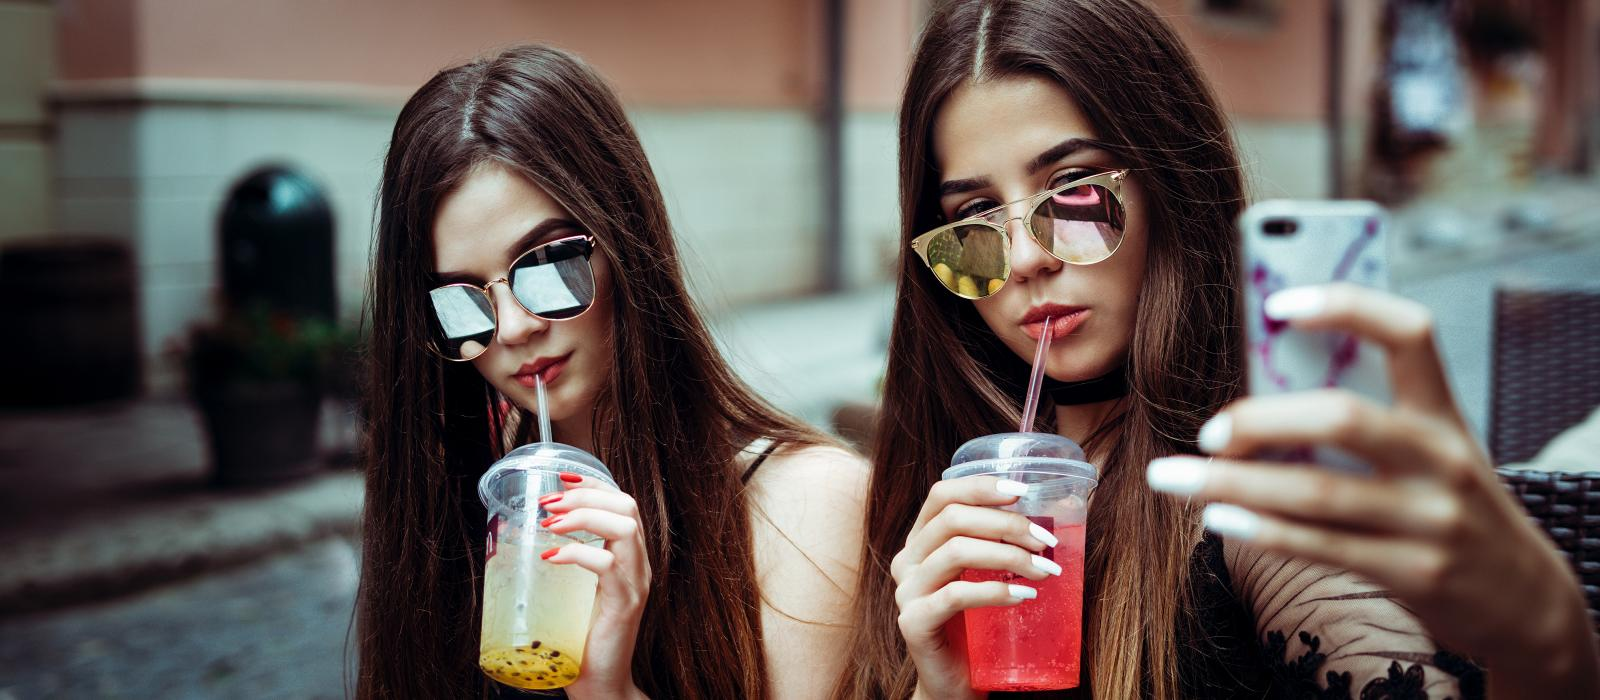 Girls drinking milkshakes